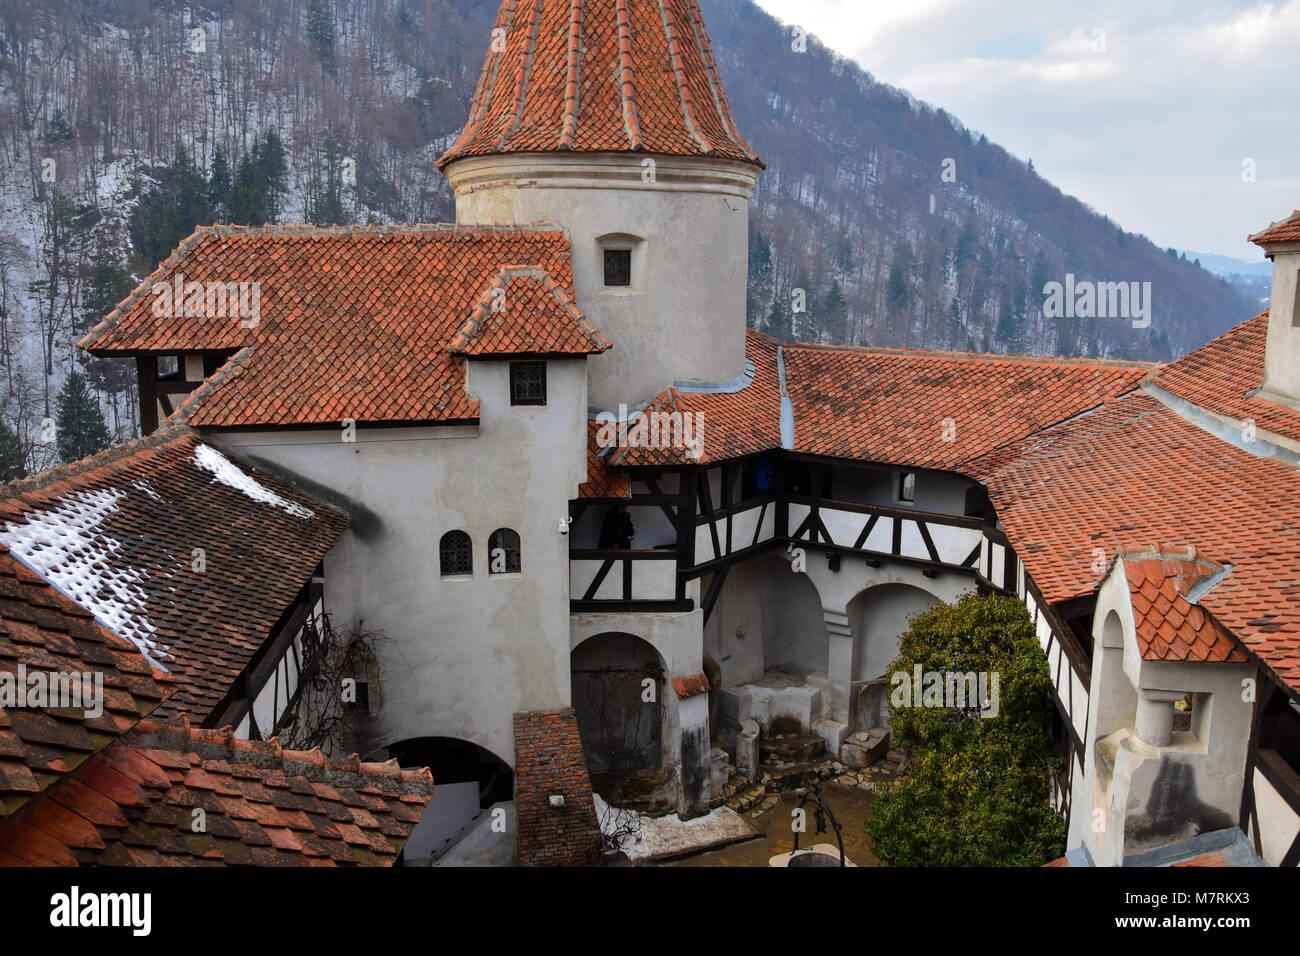 Bran, Rumänien. Februar 4, 2017. Im Inneren der Burg Bran (Bran Castelul), auch bekannt als Schloss des 'Dracula Stockbild